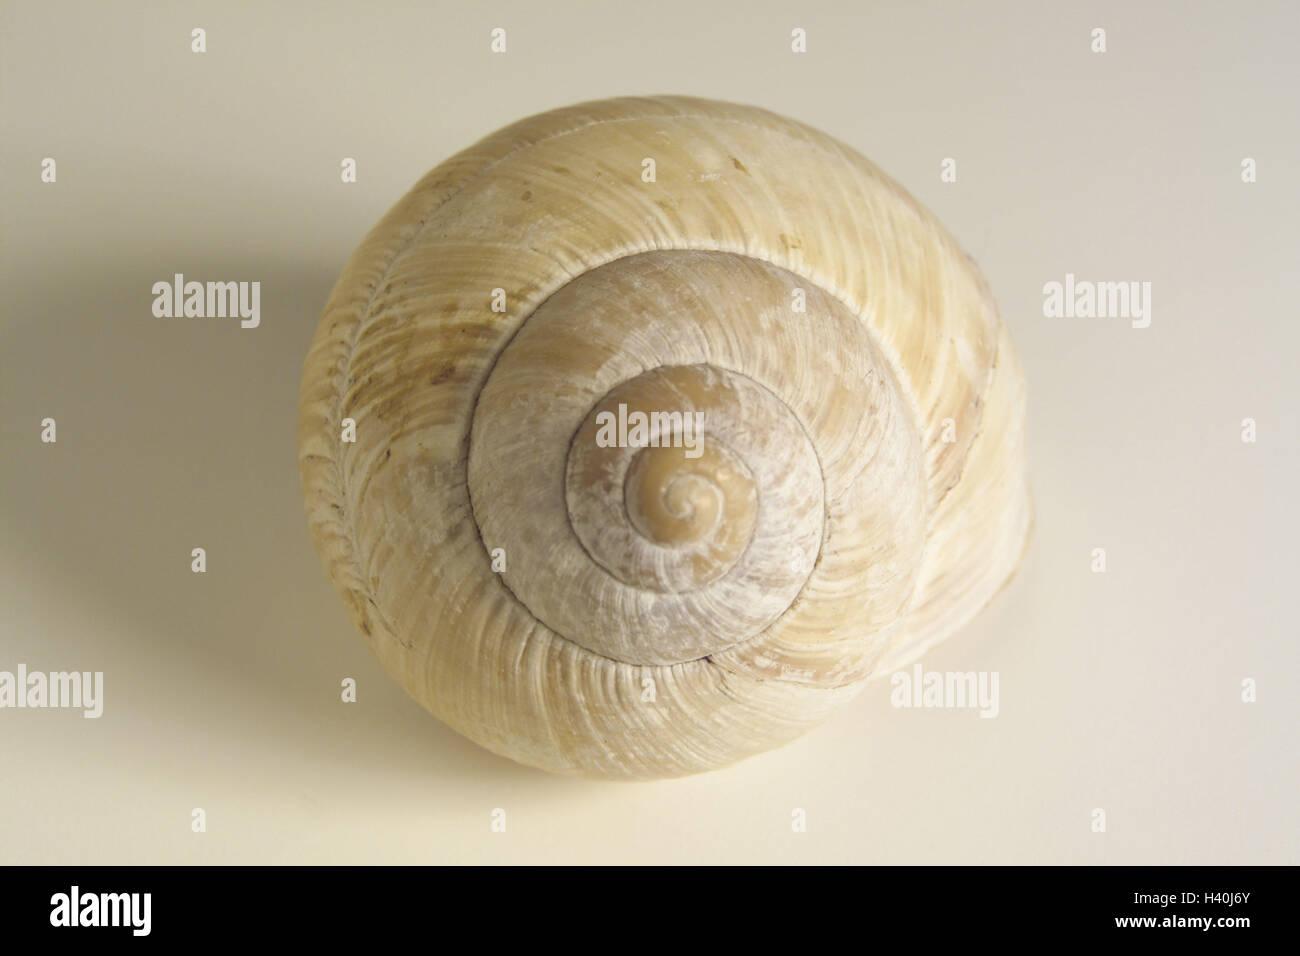 Snail Icon Imágenes De Stock & Snail Icon Fotos De Stock - Alamy